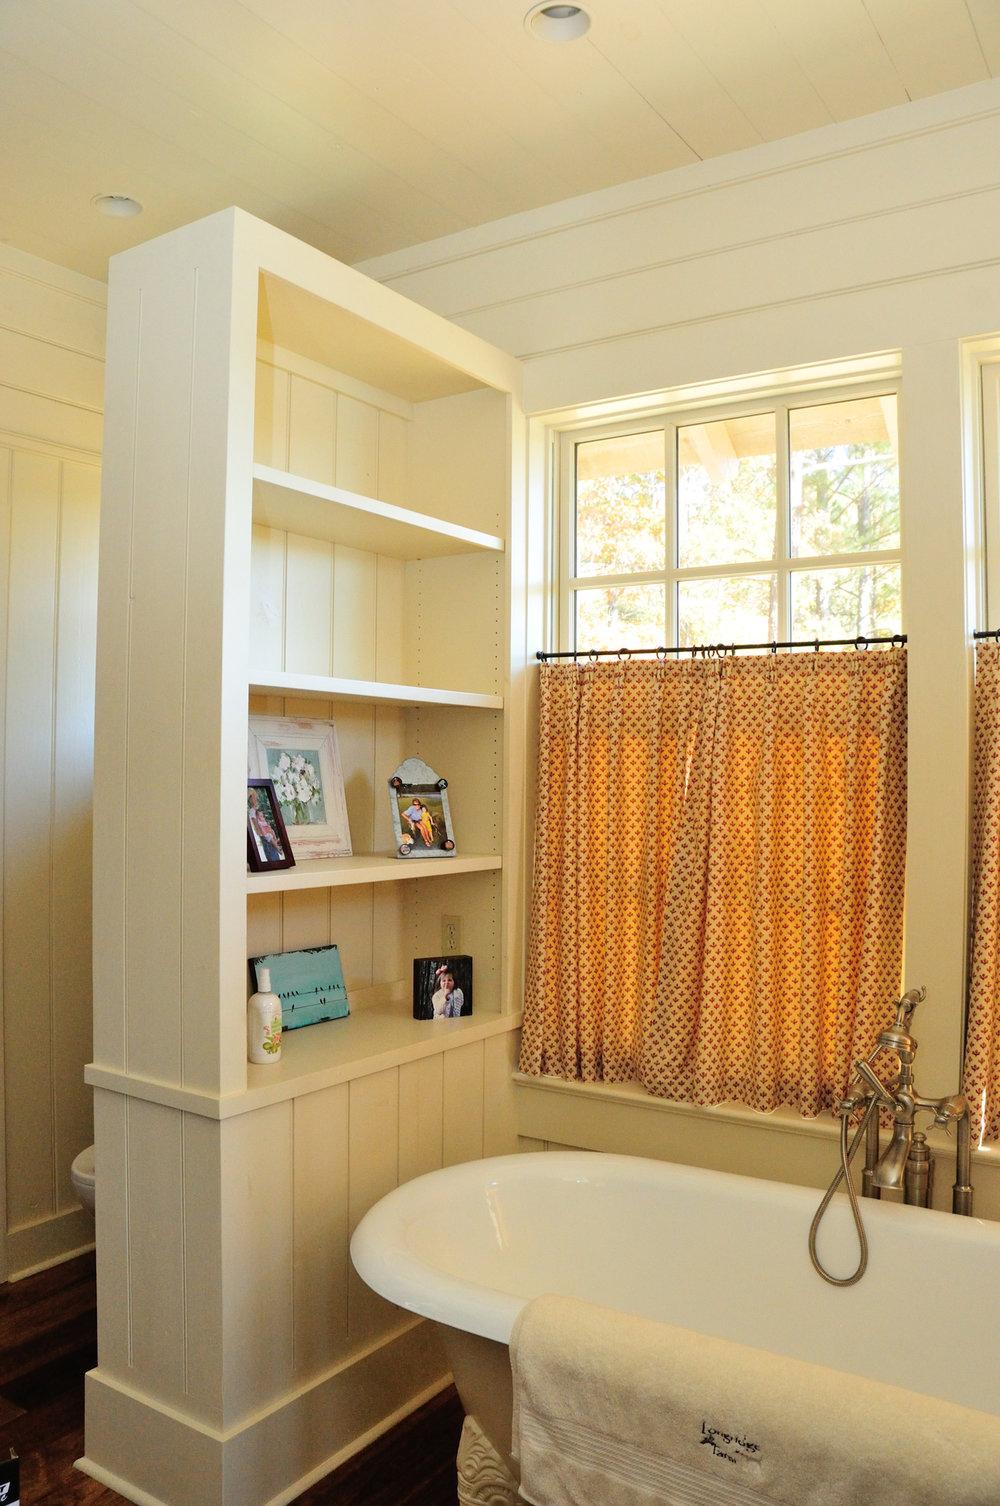 longridge_farm_lakehouse_04_lake_house_her_master_bathroom_bath_room_claw_foot_tub_wood_panel_1300.jpg